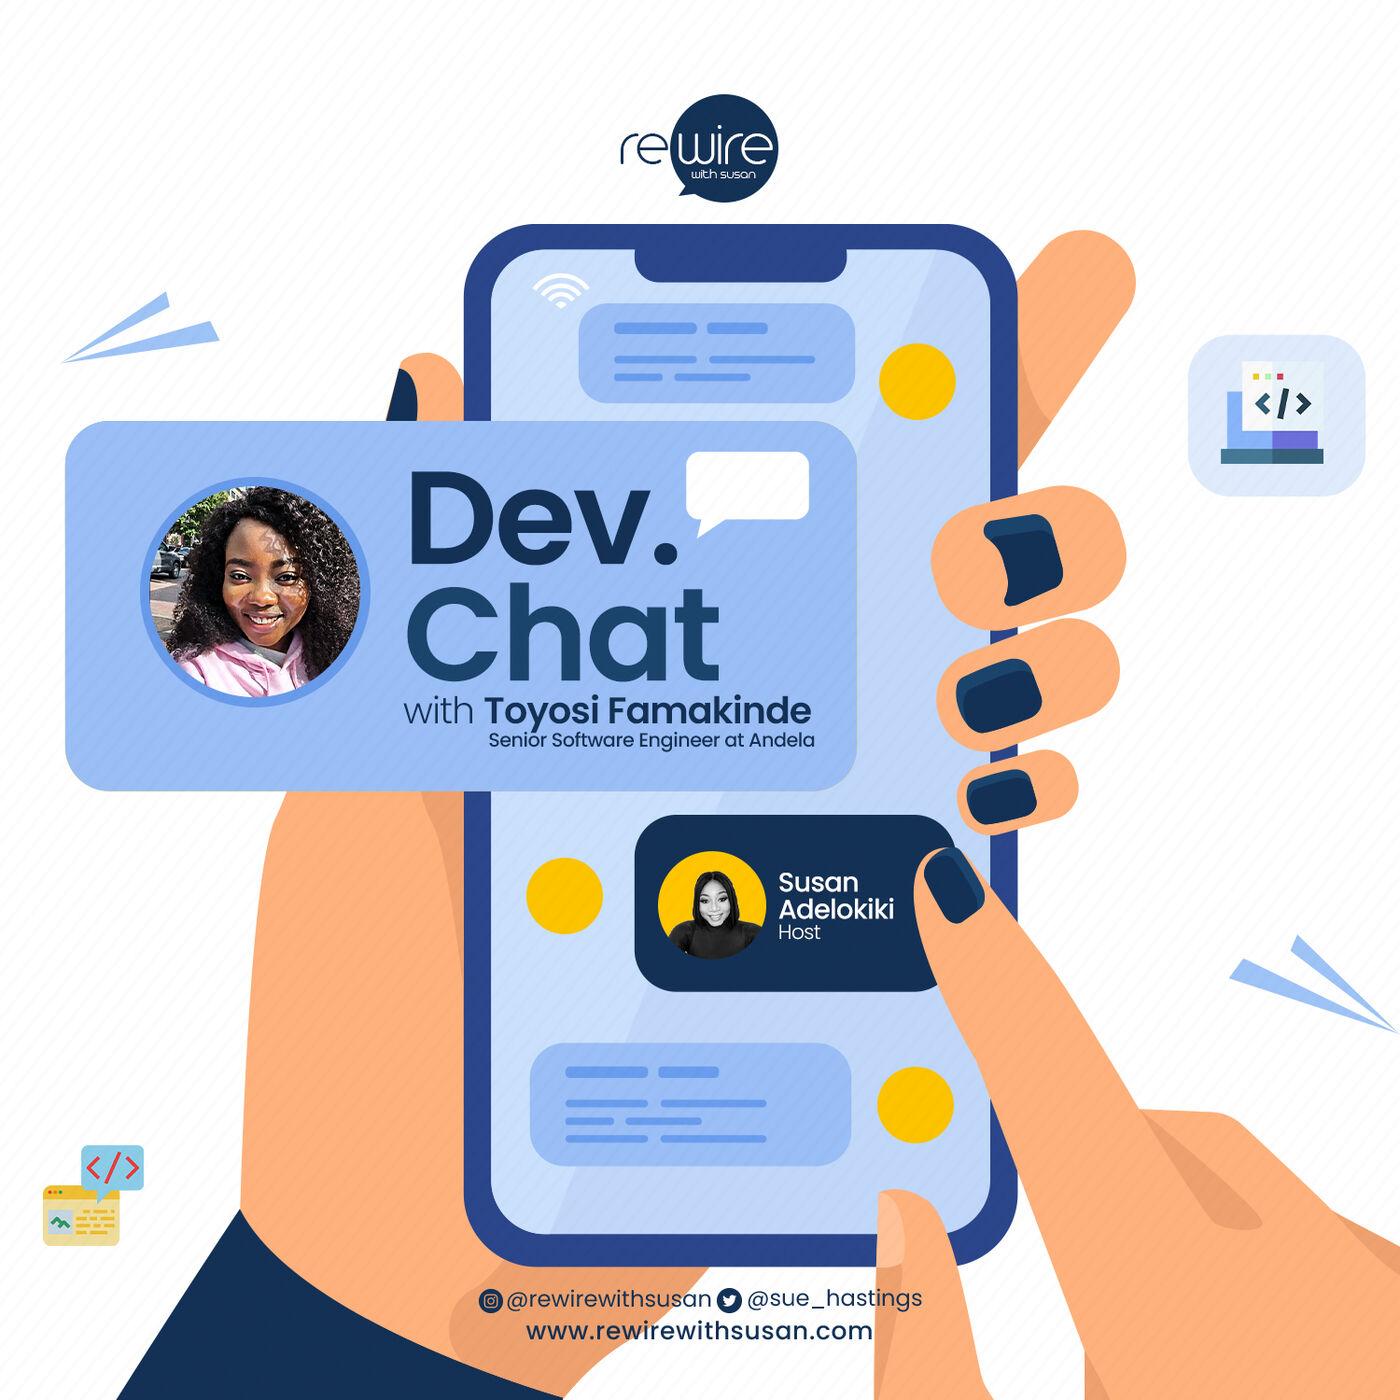 Dev. Chat with Toyosi Famakinde(Senior Software Engineer at Andela)